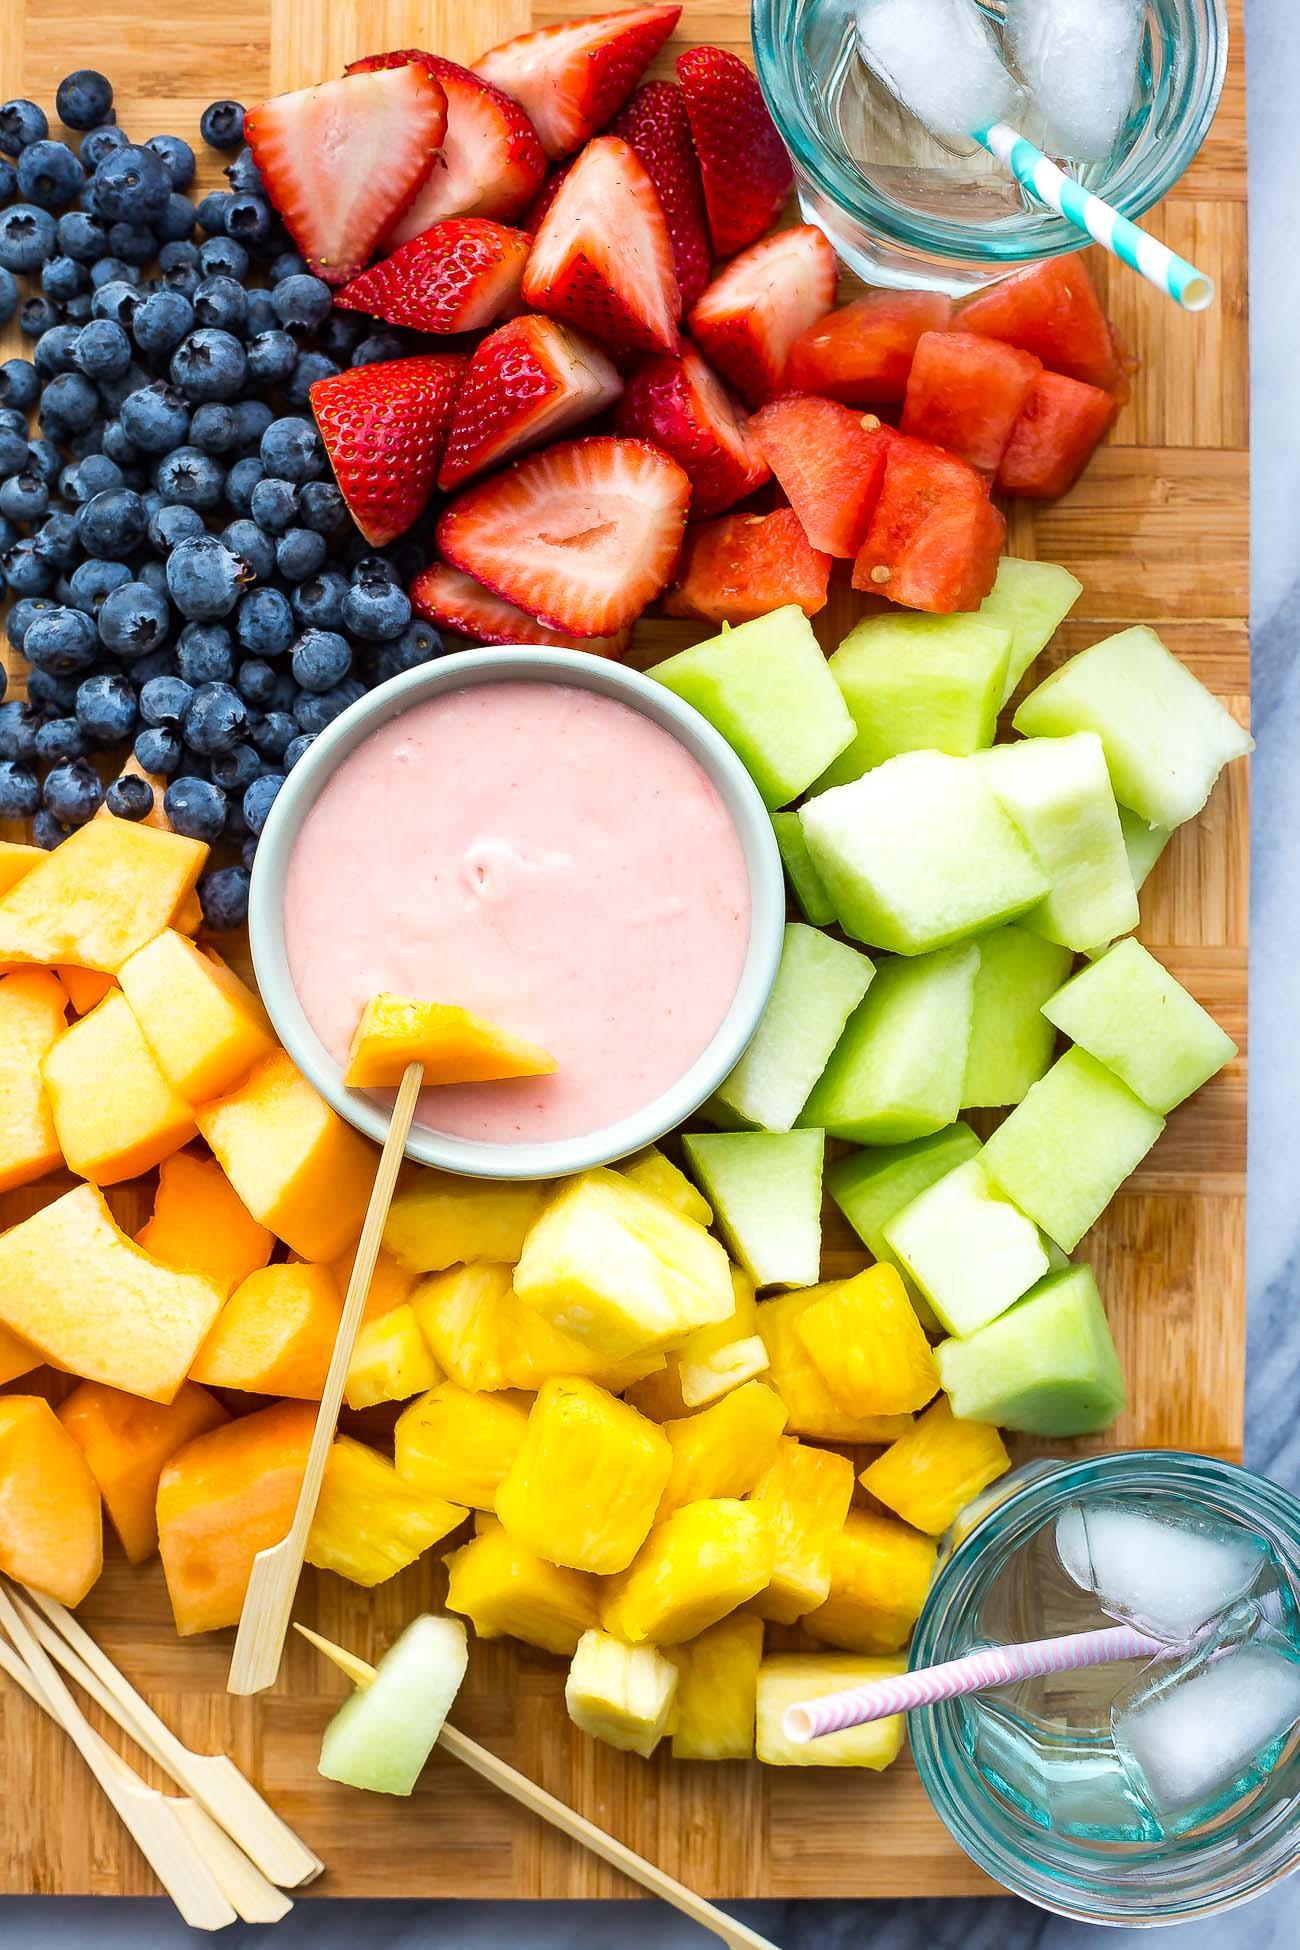 Strawberry-Fruit-Dip-Recipe-1-1.jpg